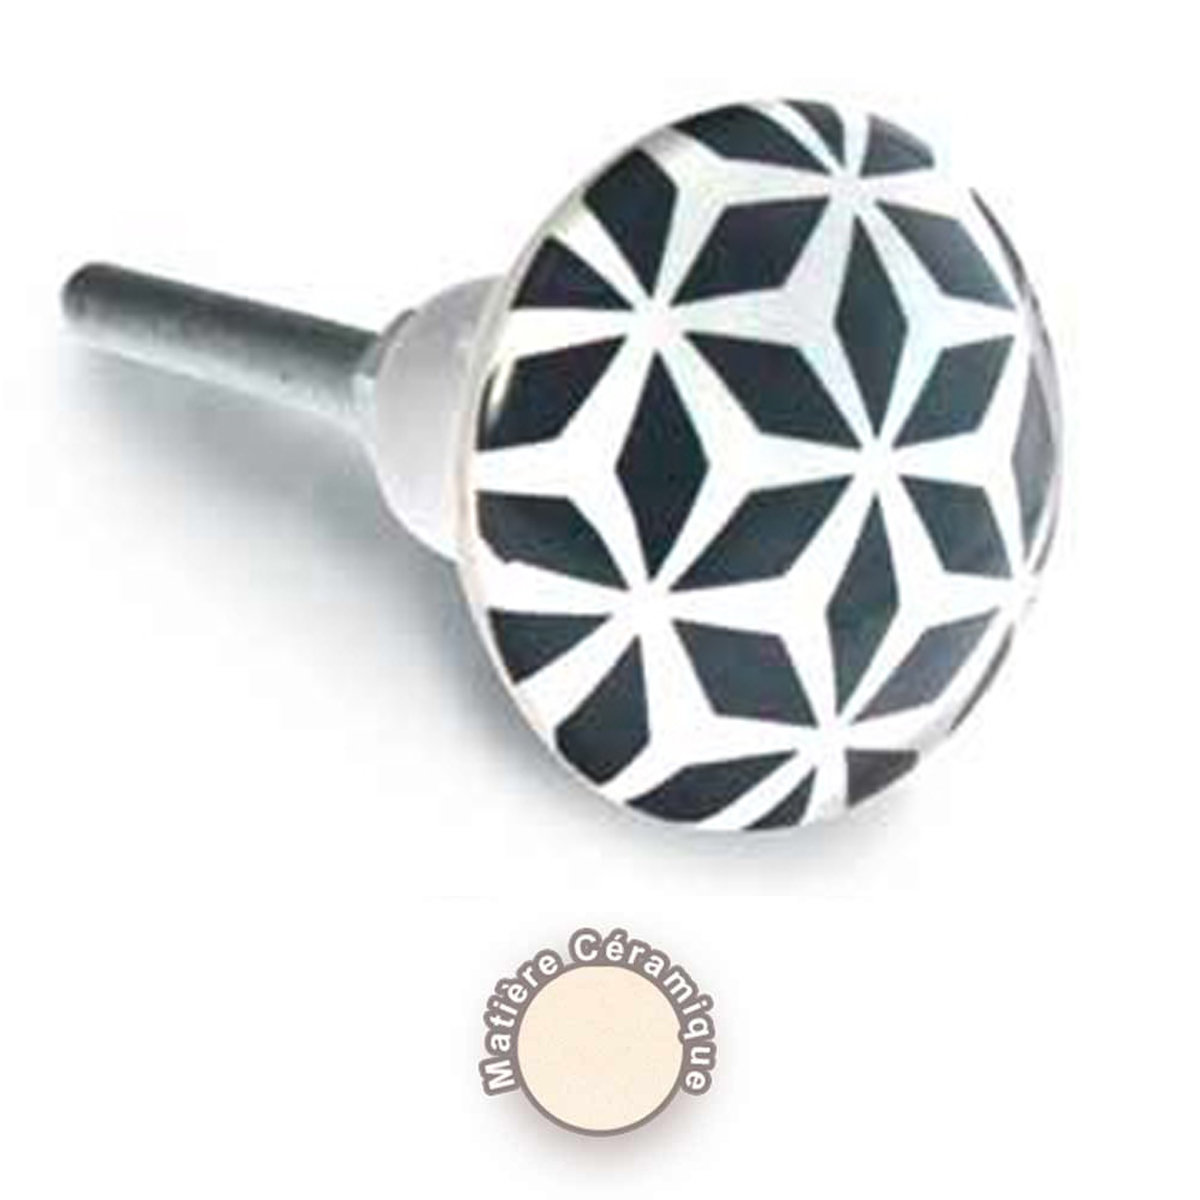 Bouton meuble céramique \'Boho\' noir blanc - 65x35 mm - [A0399]